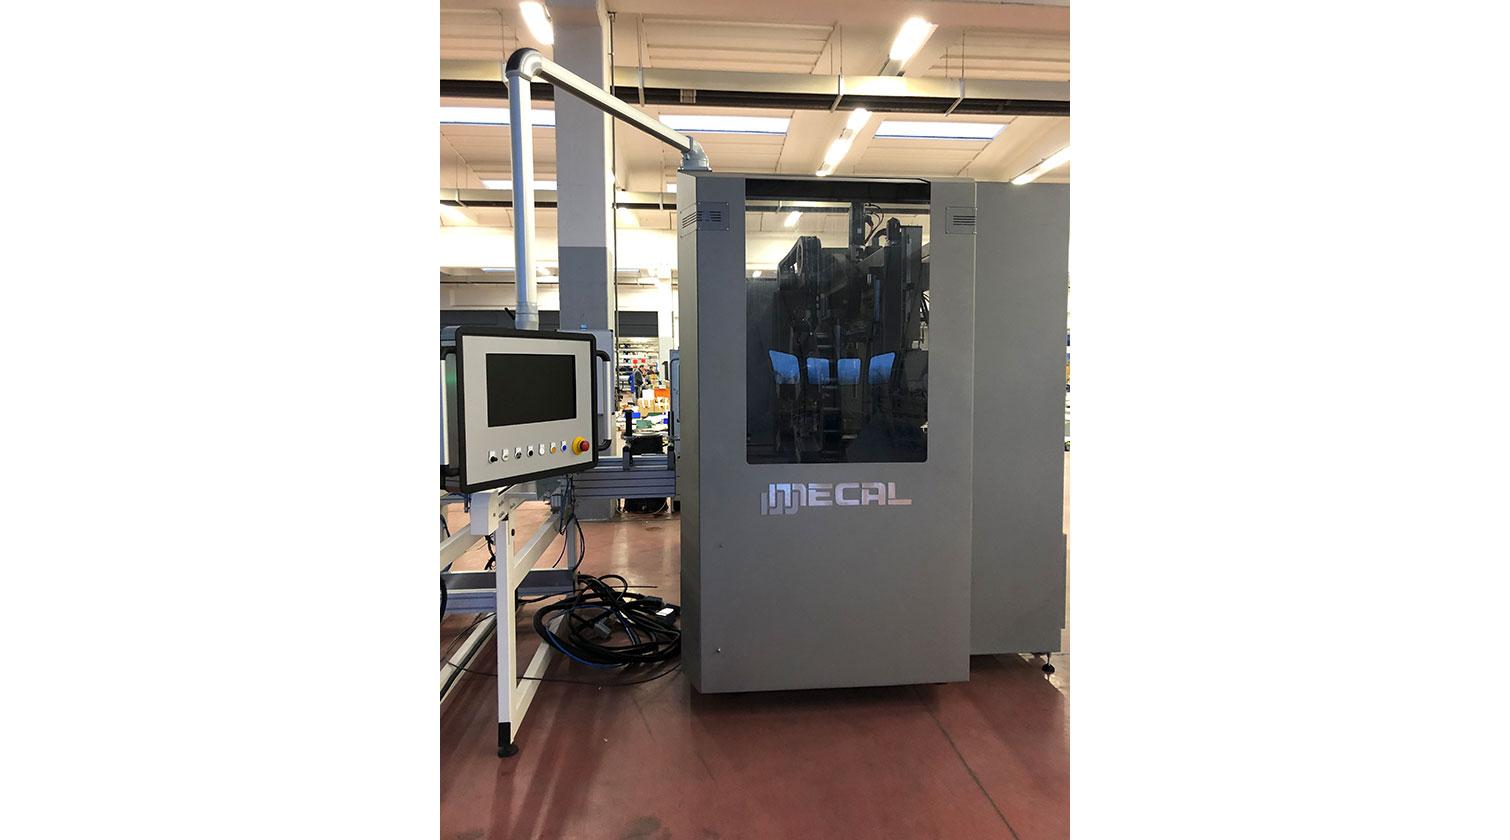 INT aluminum CNC Mecal MC 316 fabrication centre operator interface 1